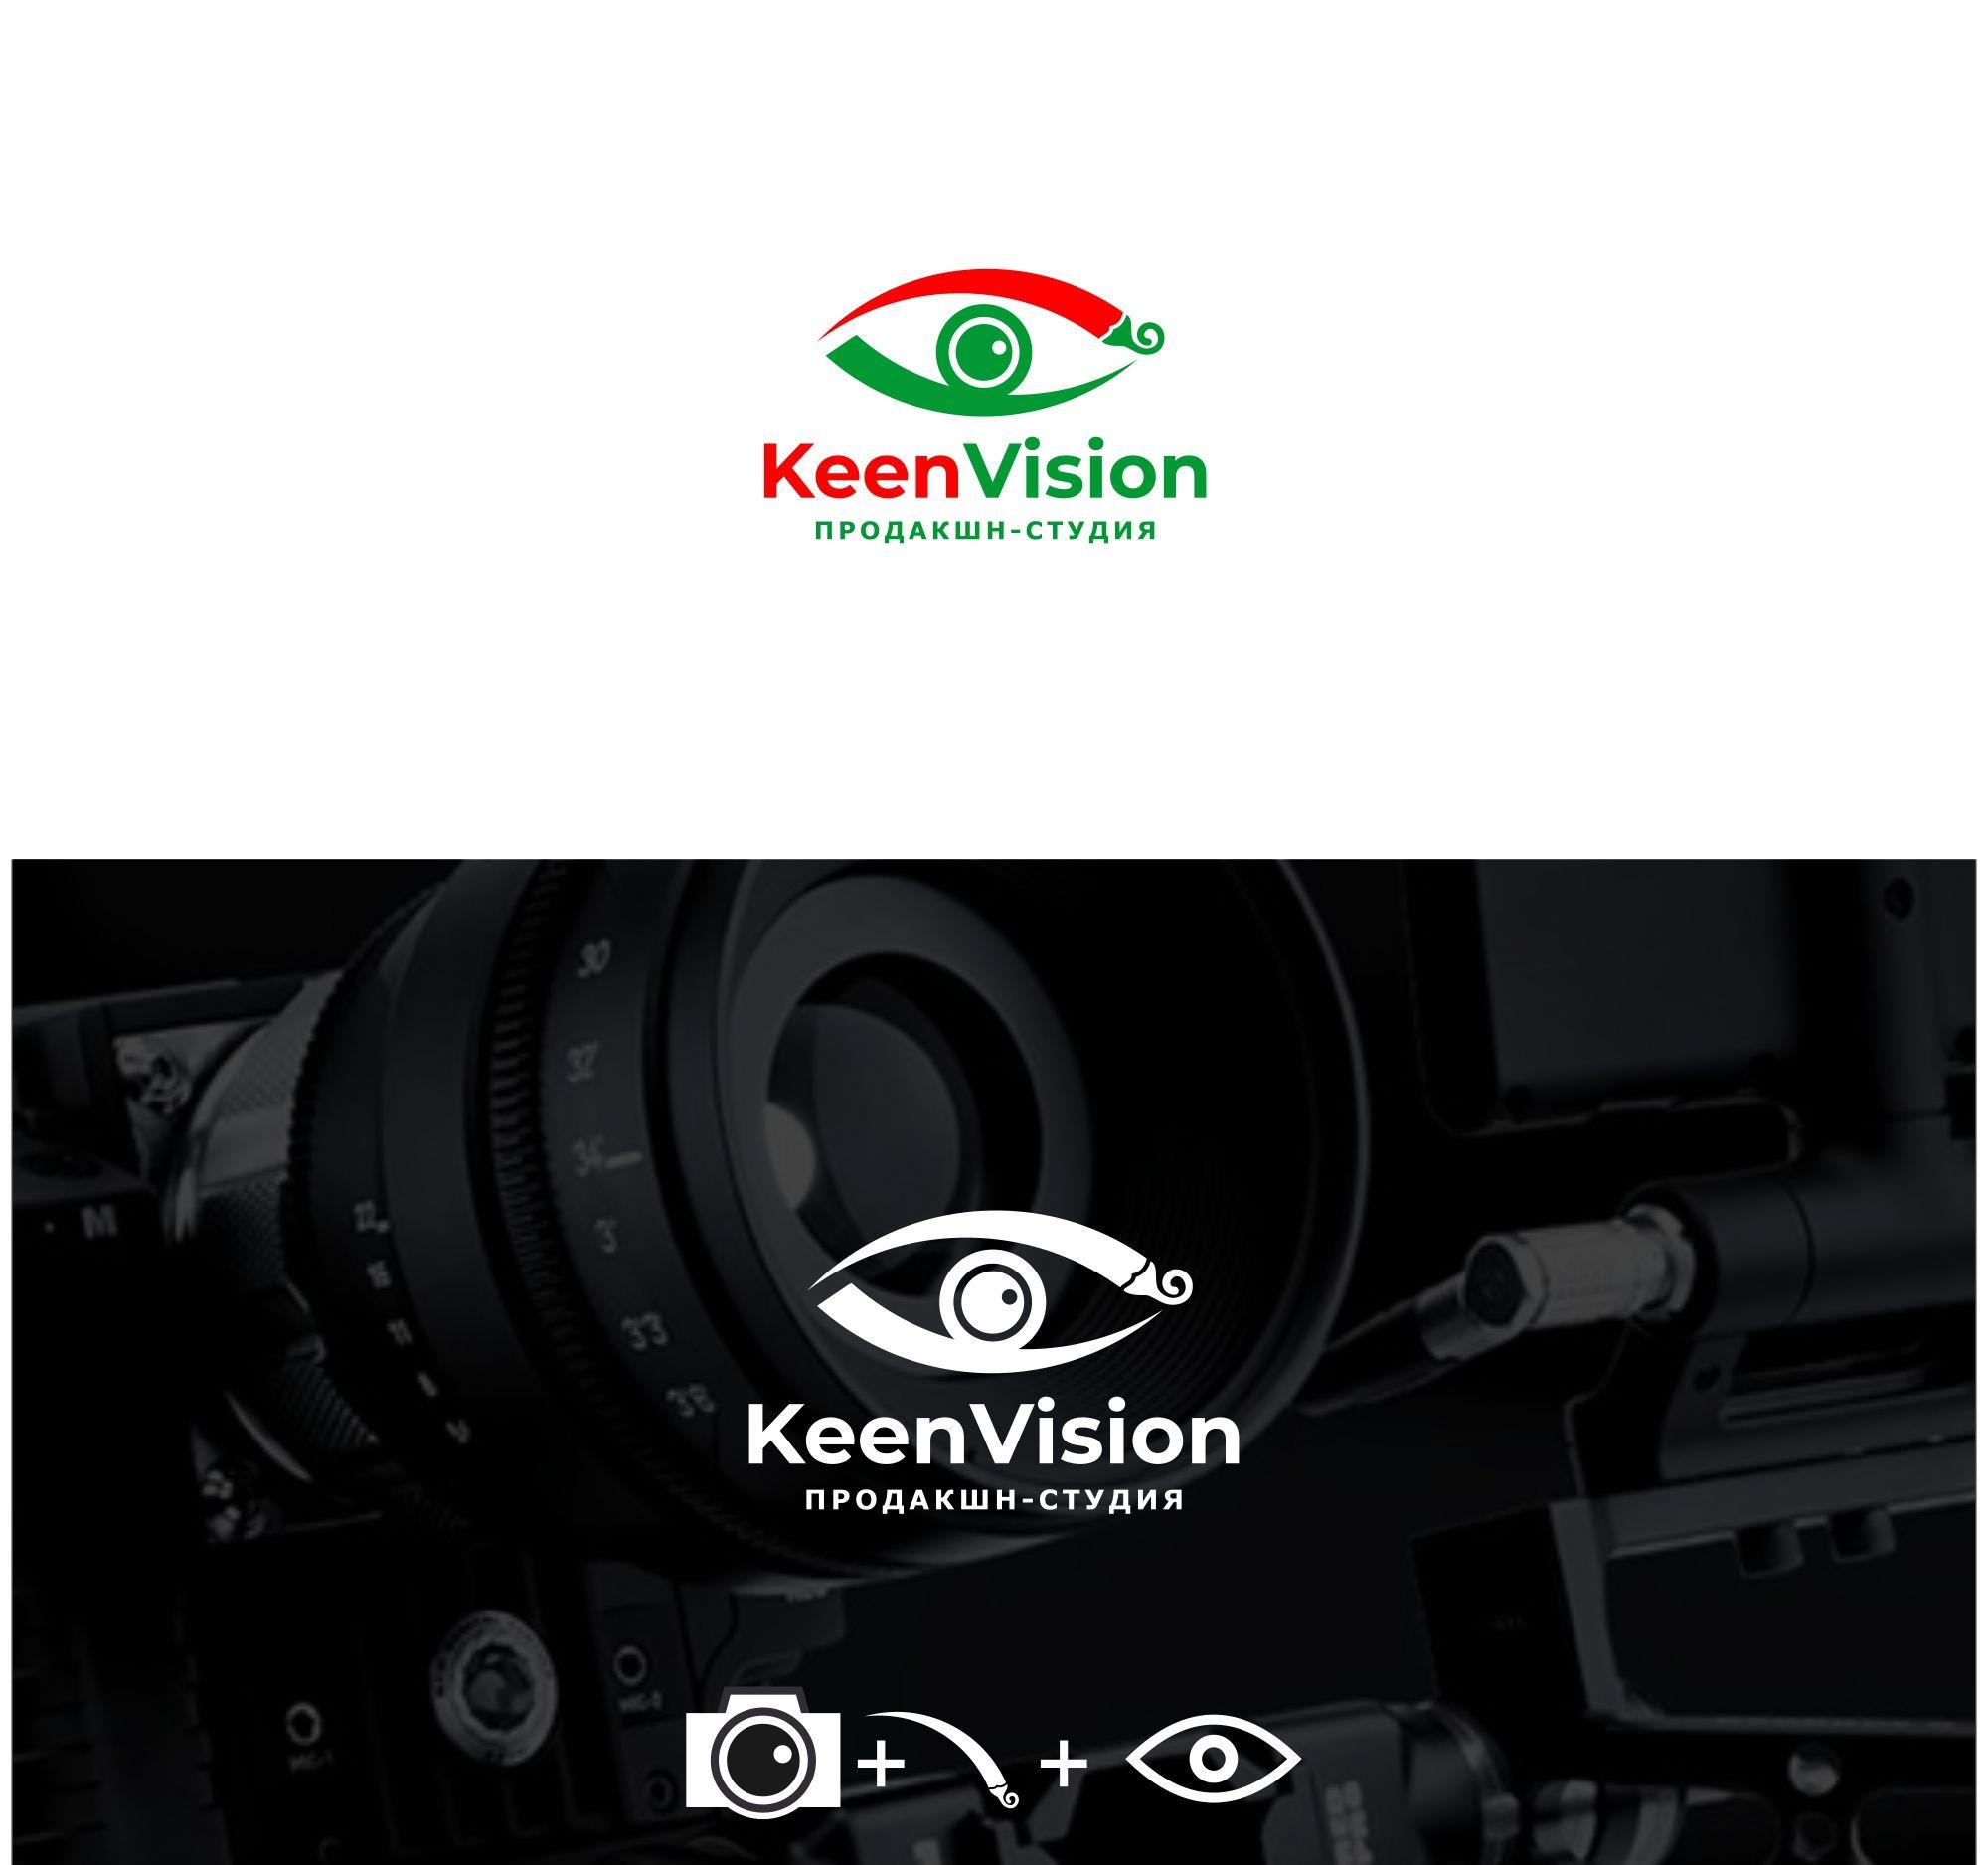 Логотип для KeenVision - дизайнер serz4868